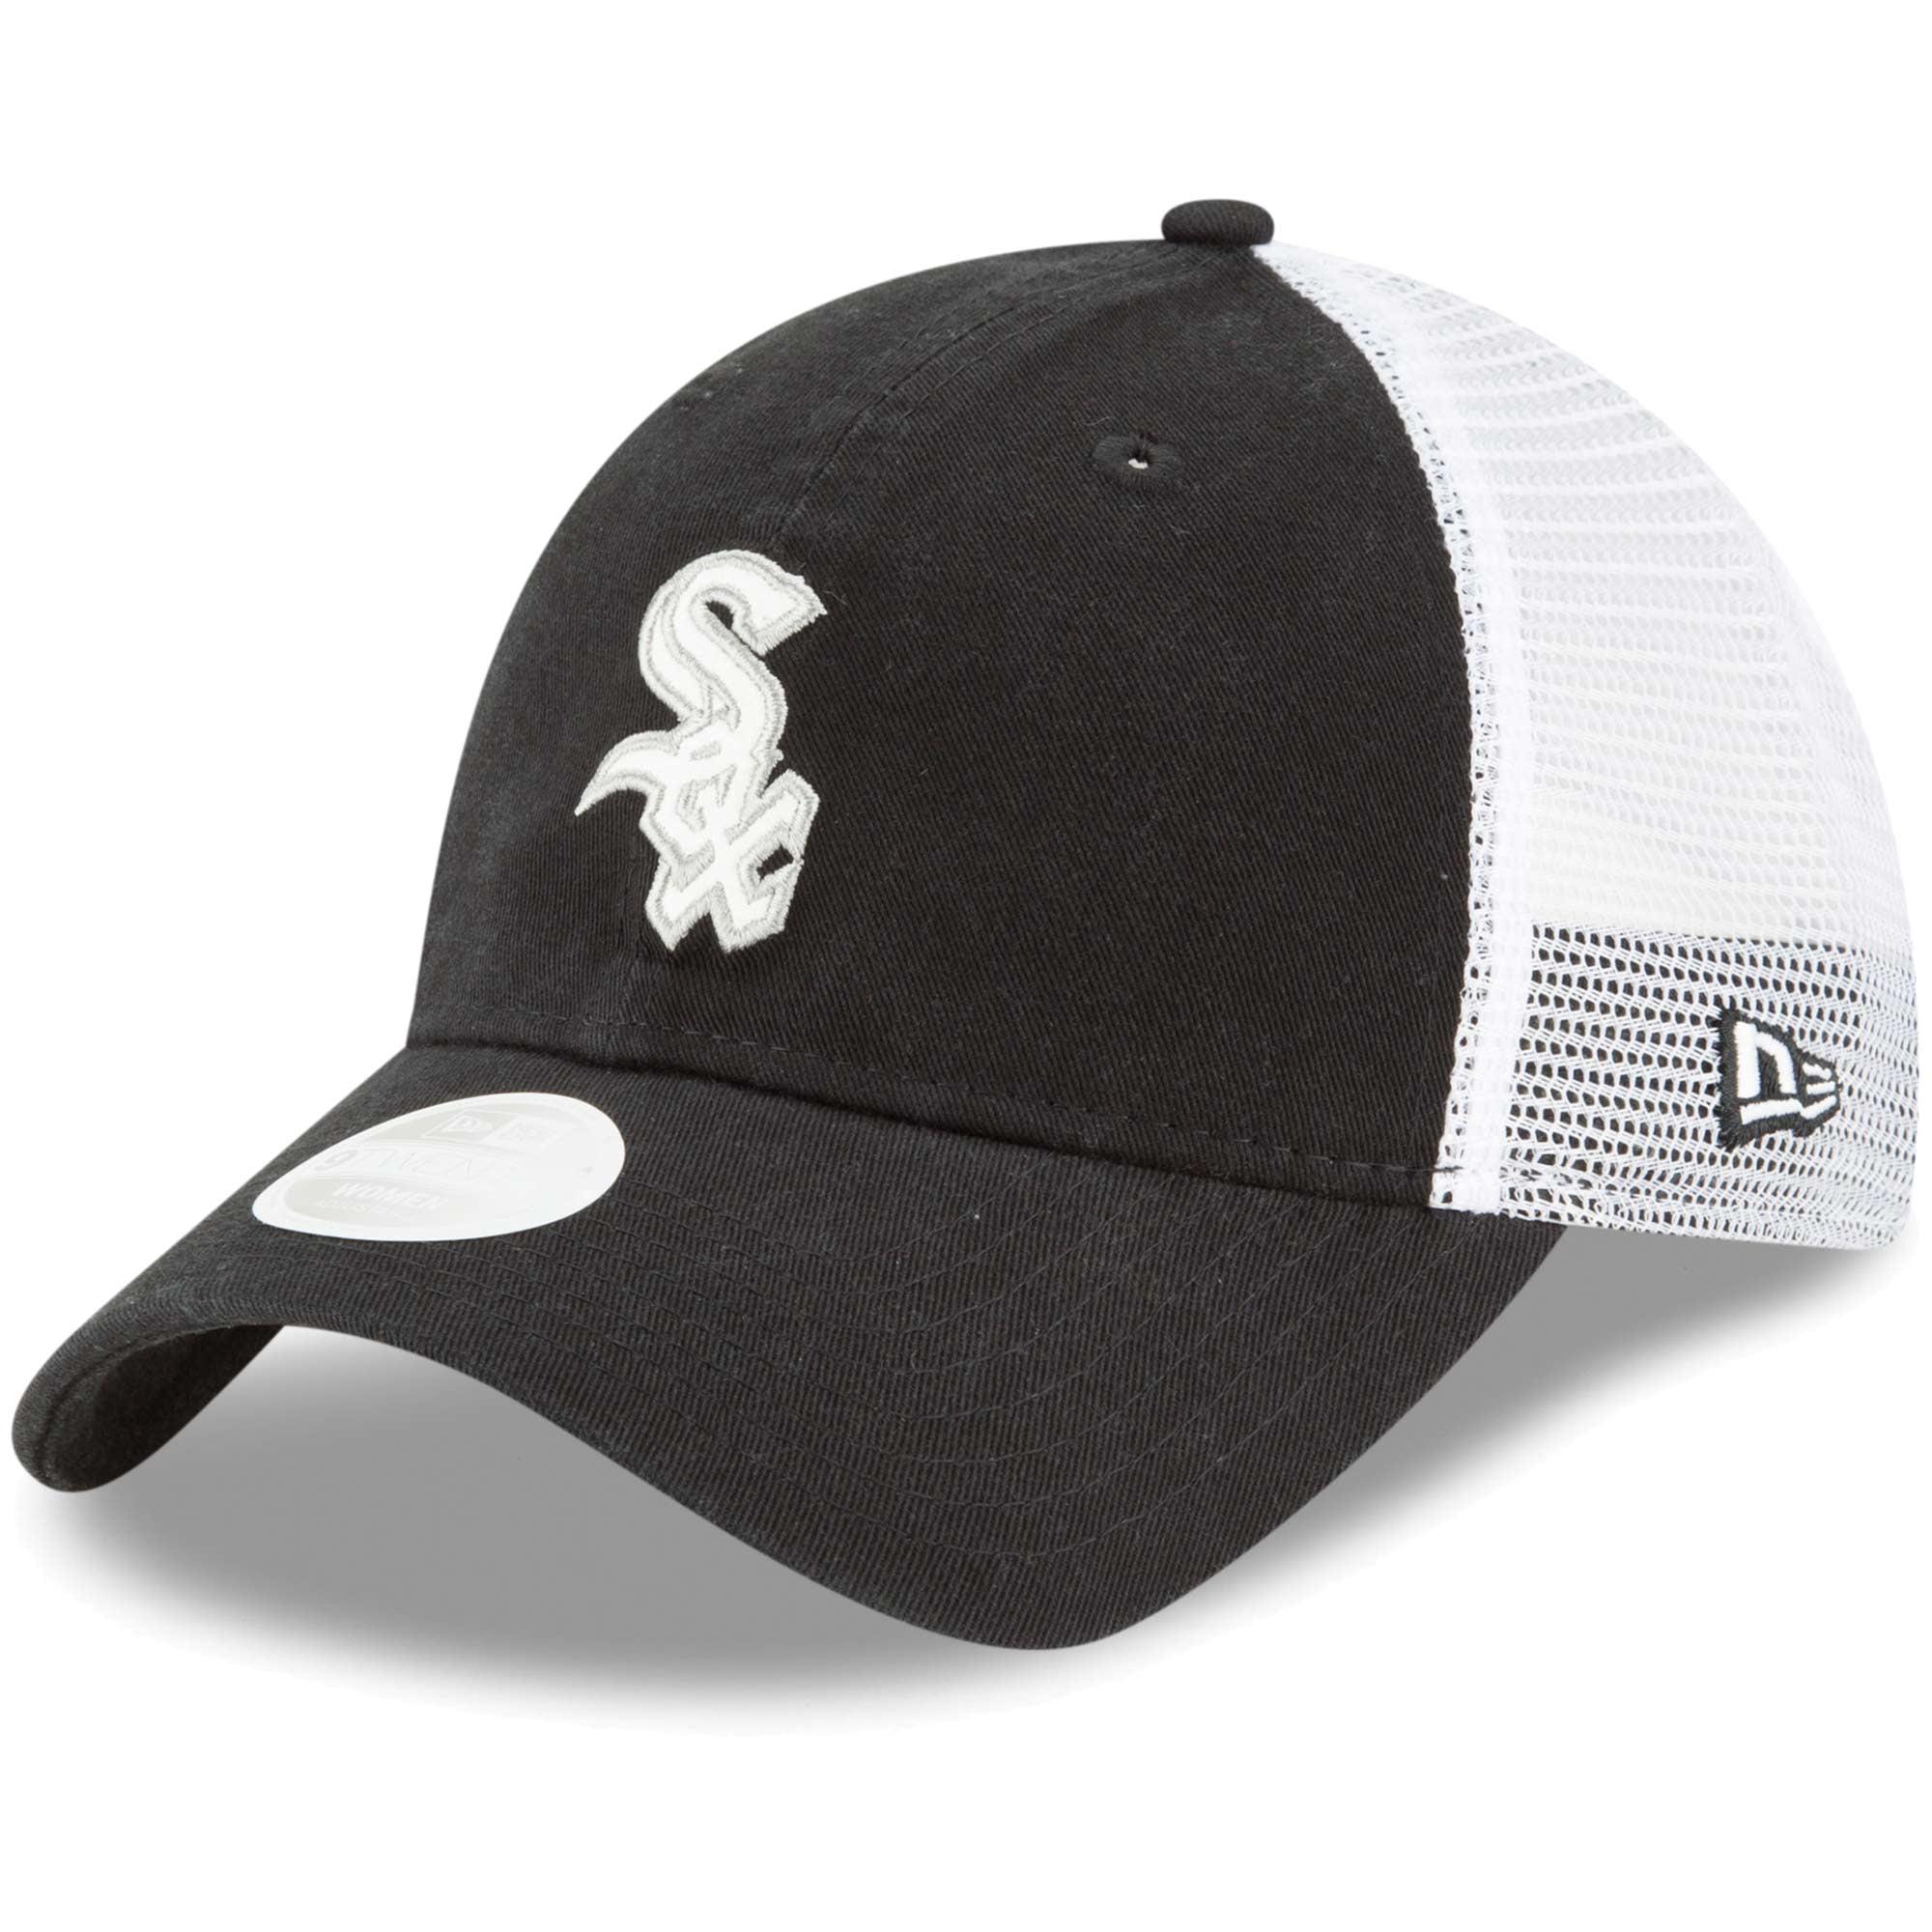 Chicago White Sox New Era Women's Trucker Shine 9TWENTY Adjustable Hat - Black - OSFA